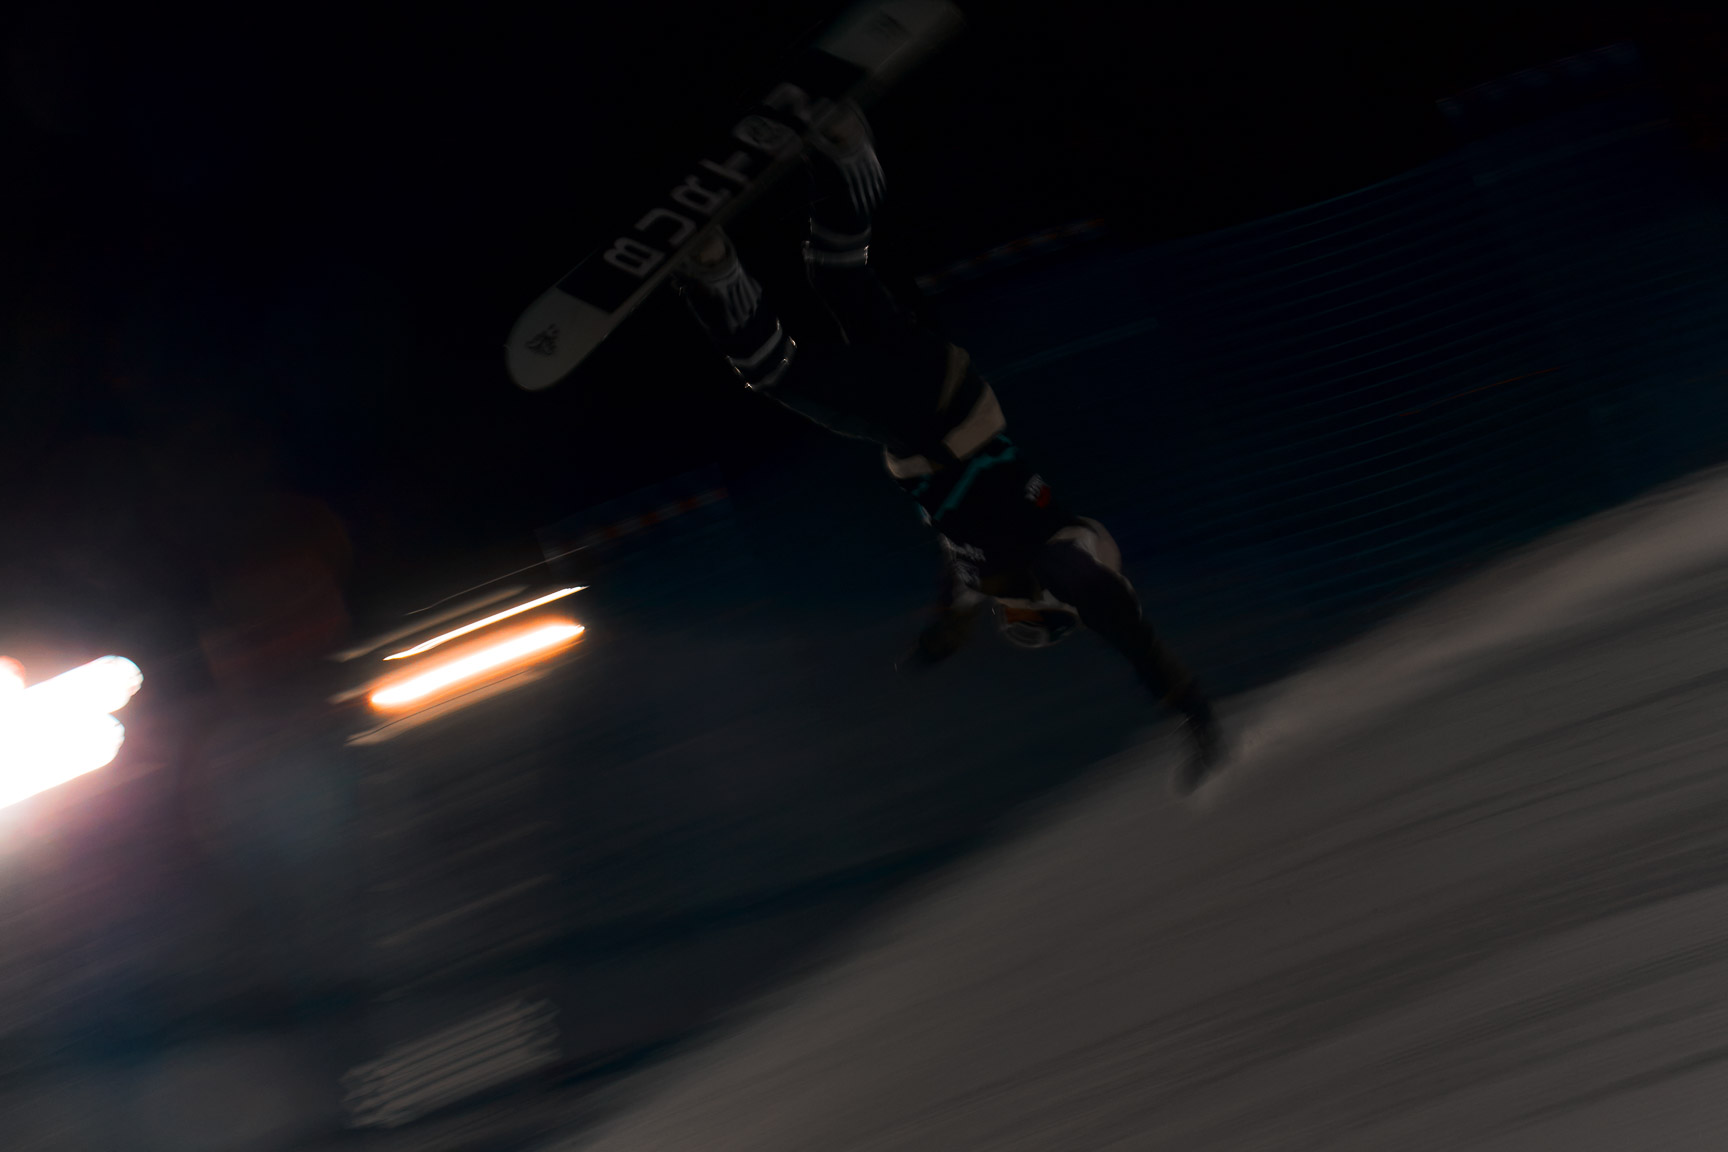 Jake Canter, Snowboard Knuckle Huck